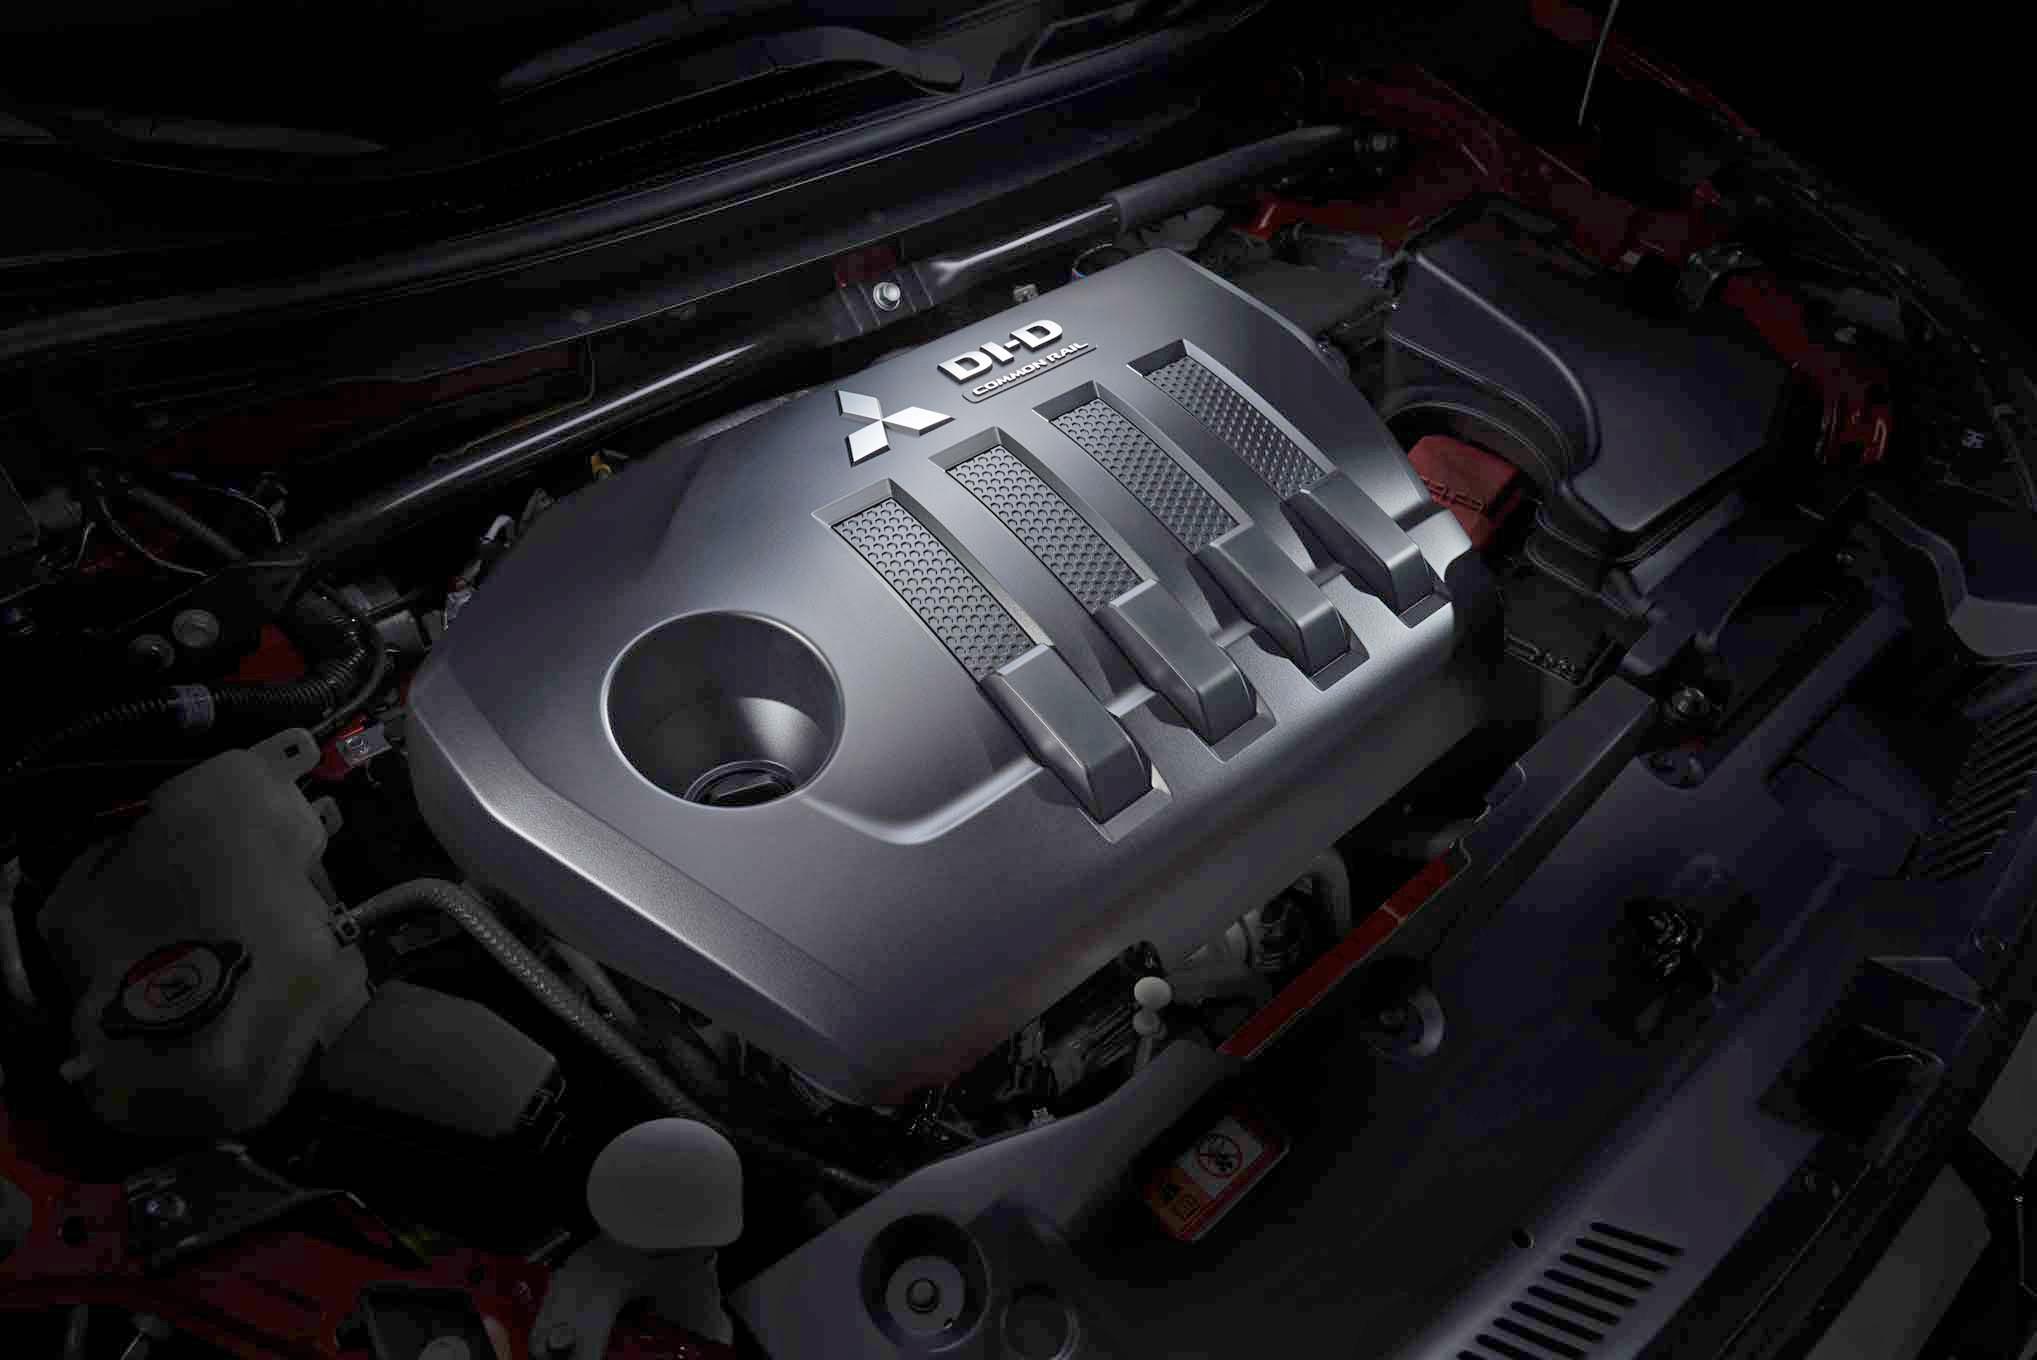 2018 Mitsubishi Eclipse Cross Engine 02 1